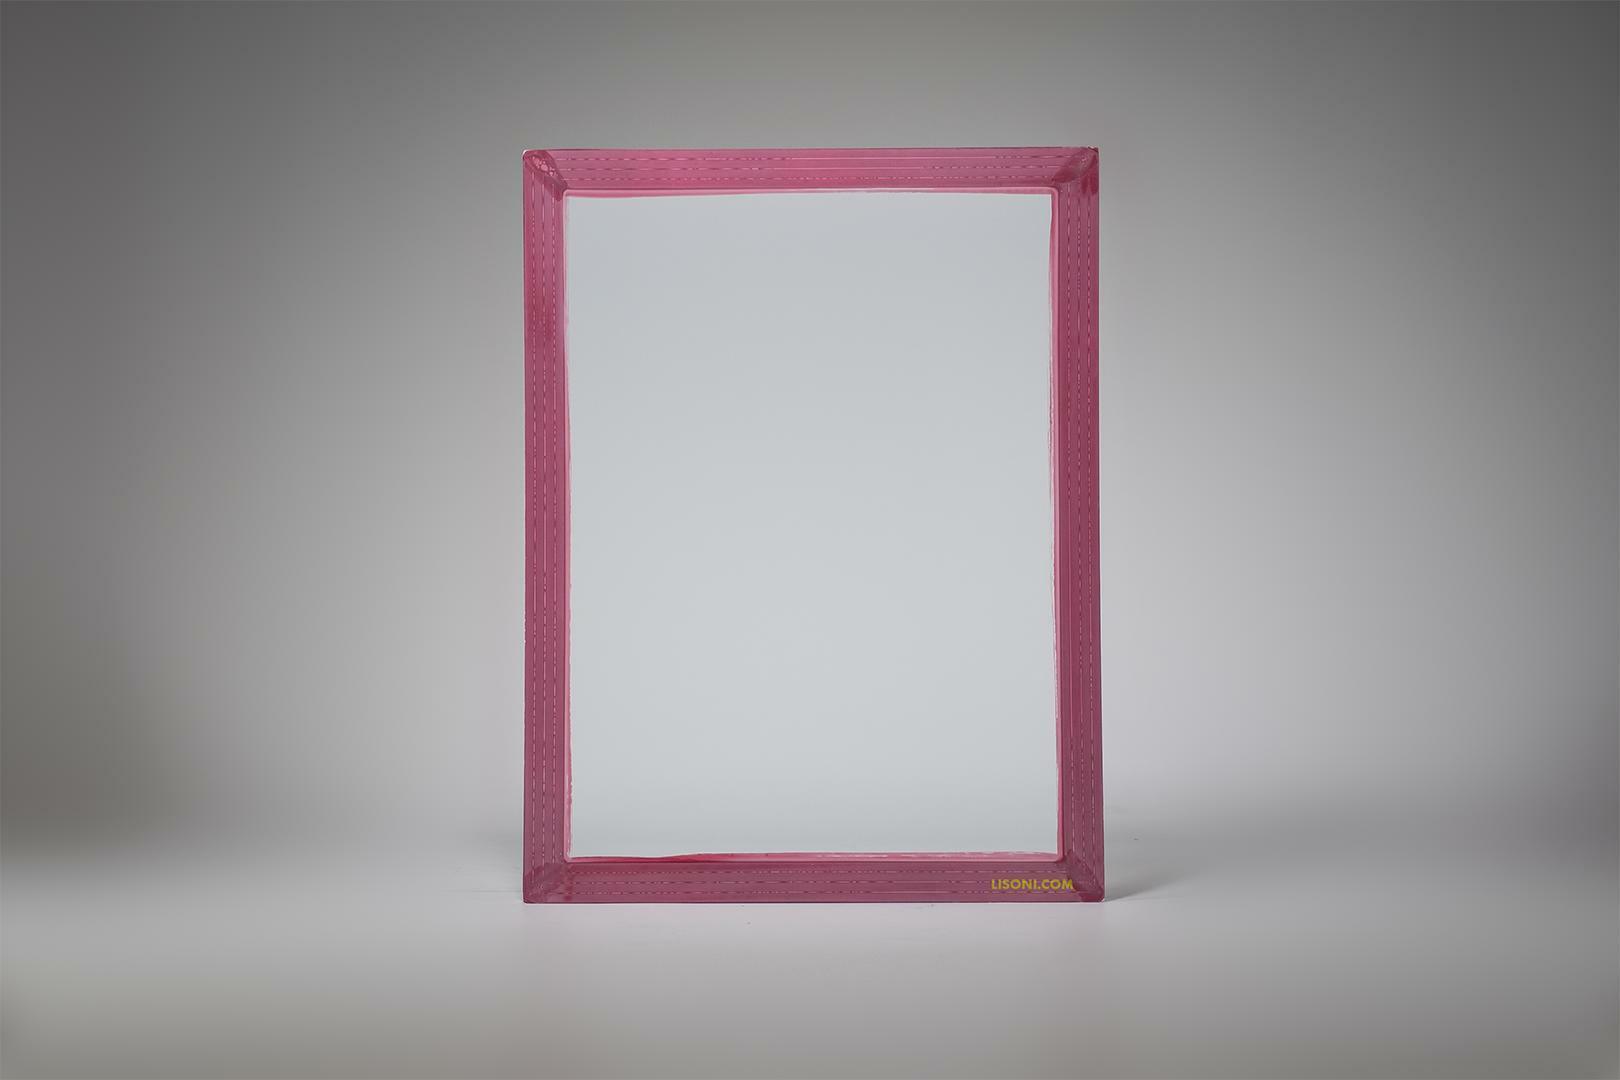 cadre de s rigraphie a3 avec tissu 54t moyen. Black Bedroom Furniture Sets. Home Design Ideas